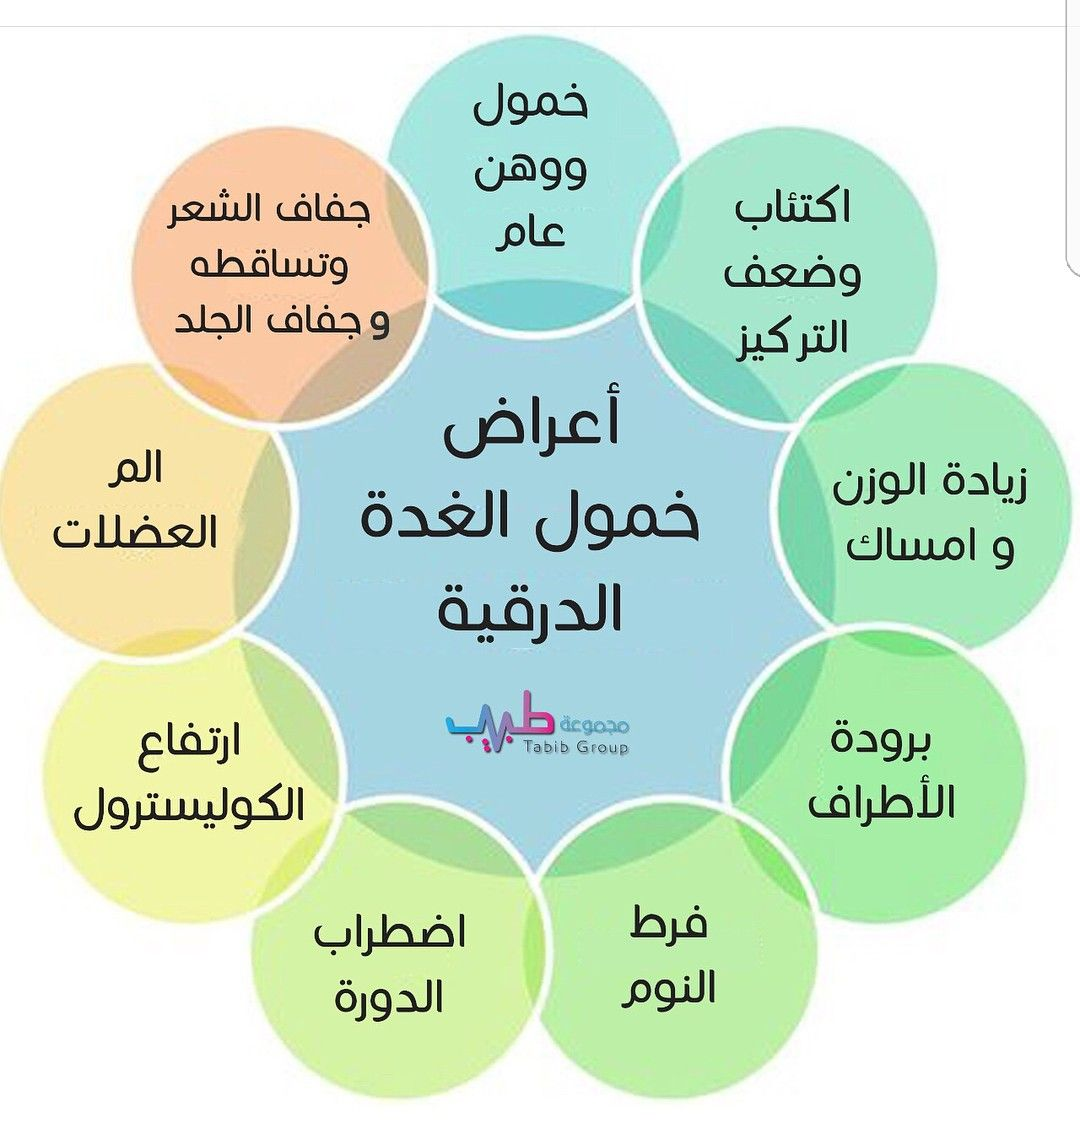 Pin By Nahedha Aladraj On أغراض خمول الغدة الدرقية Pie Chart Chart Life Rules